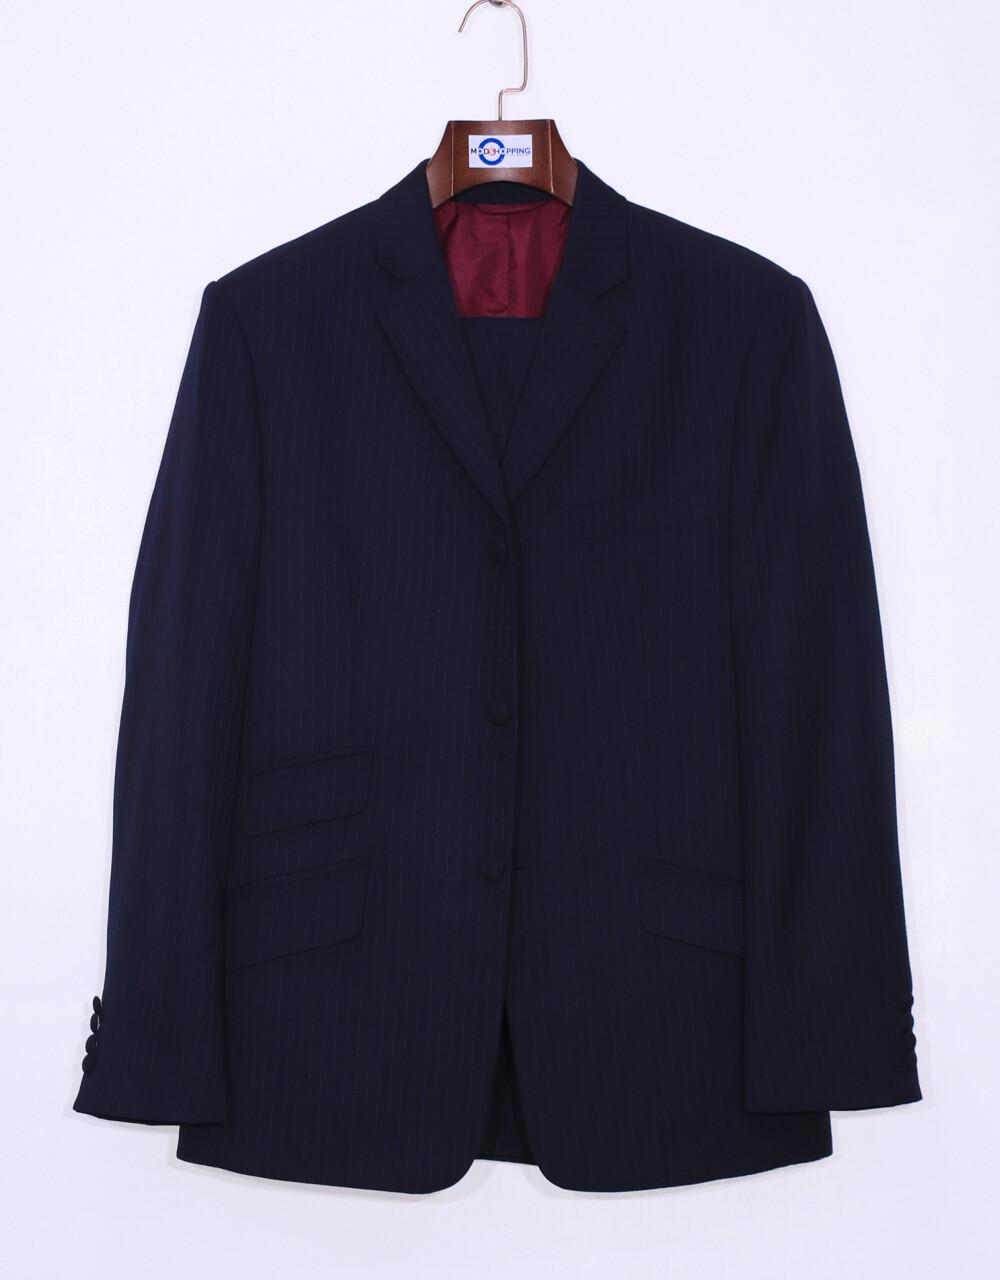 Pinstripe Suit | Dark Blue Pinstripe 3 Button Mod Suit